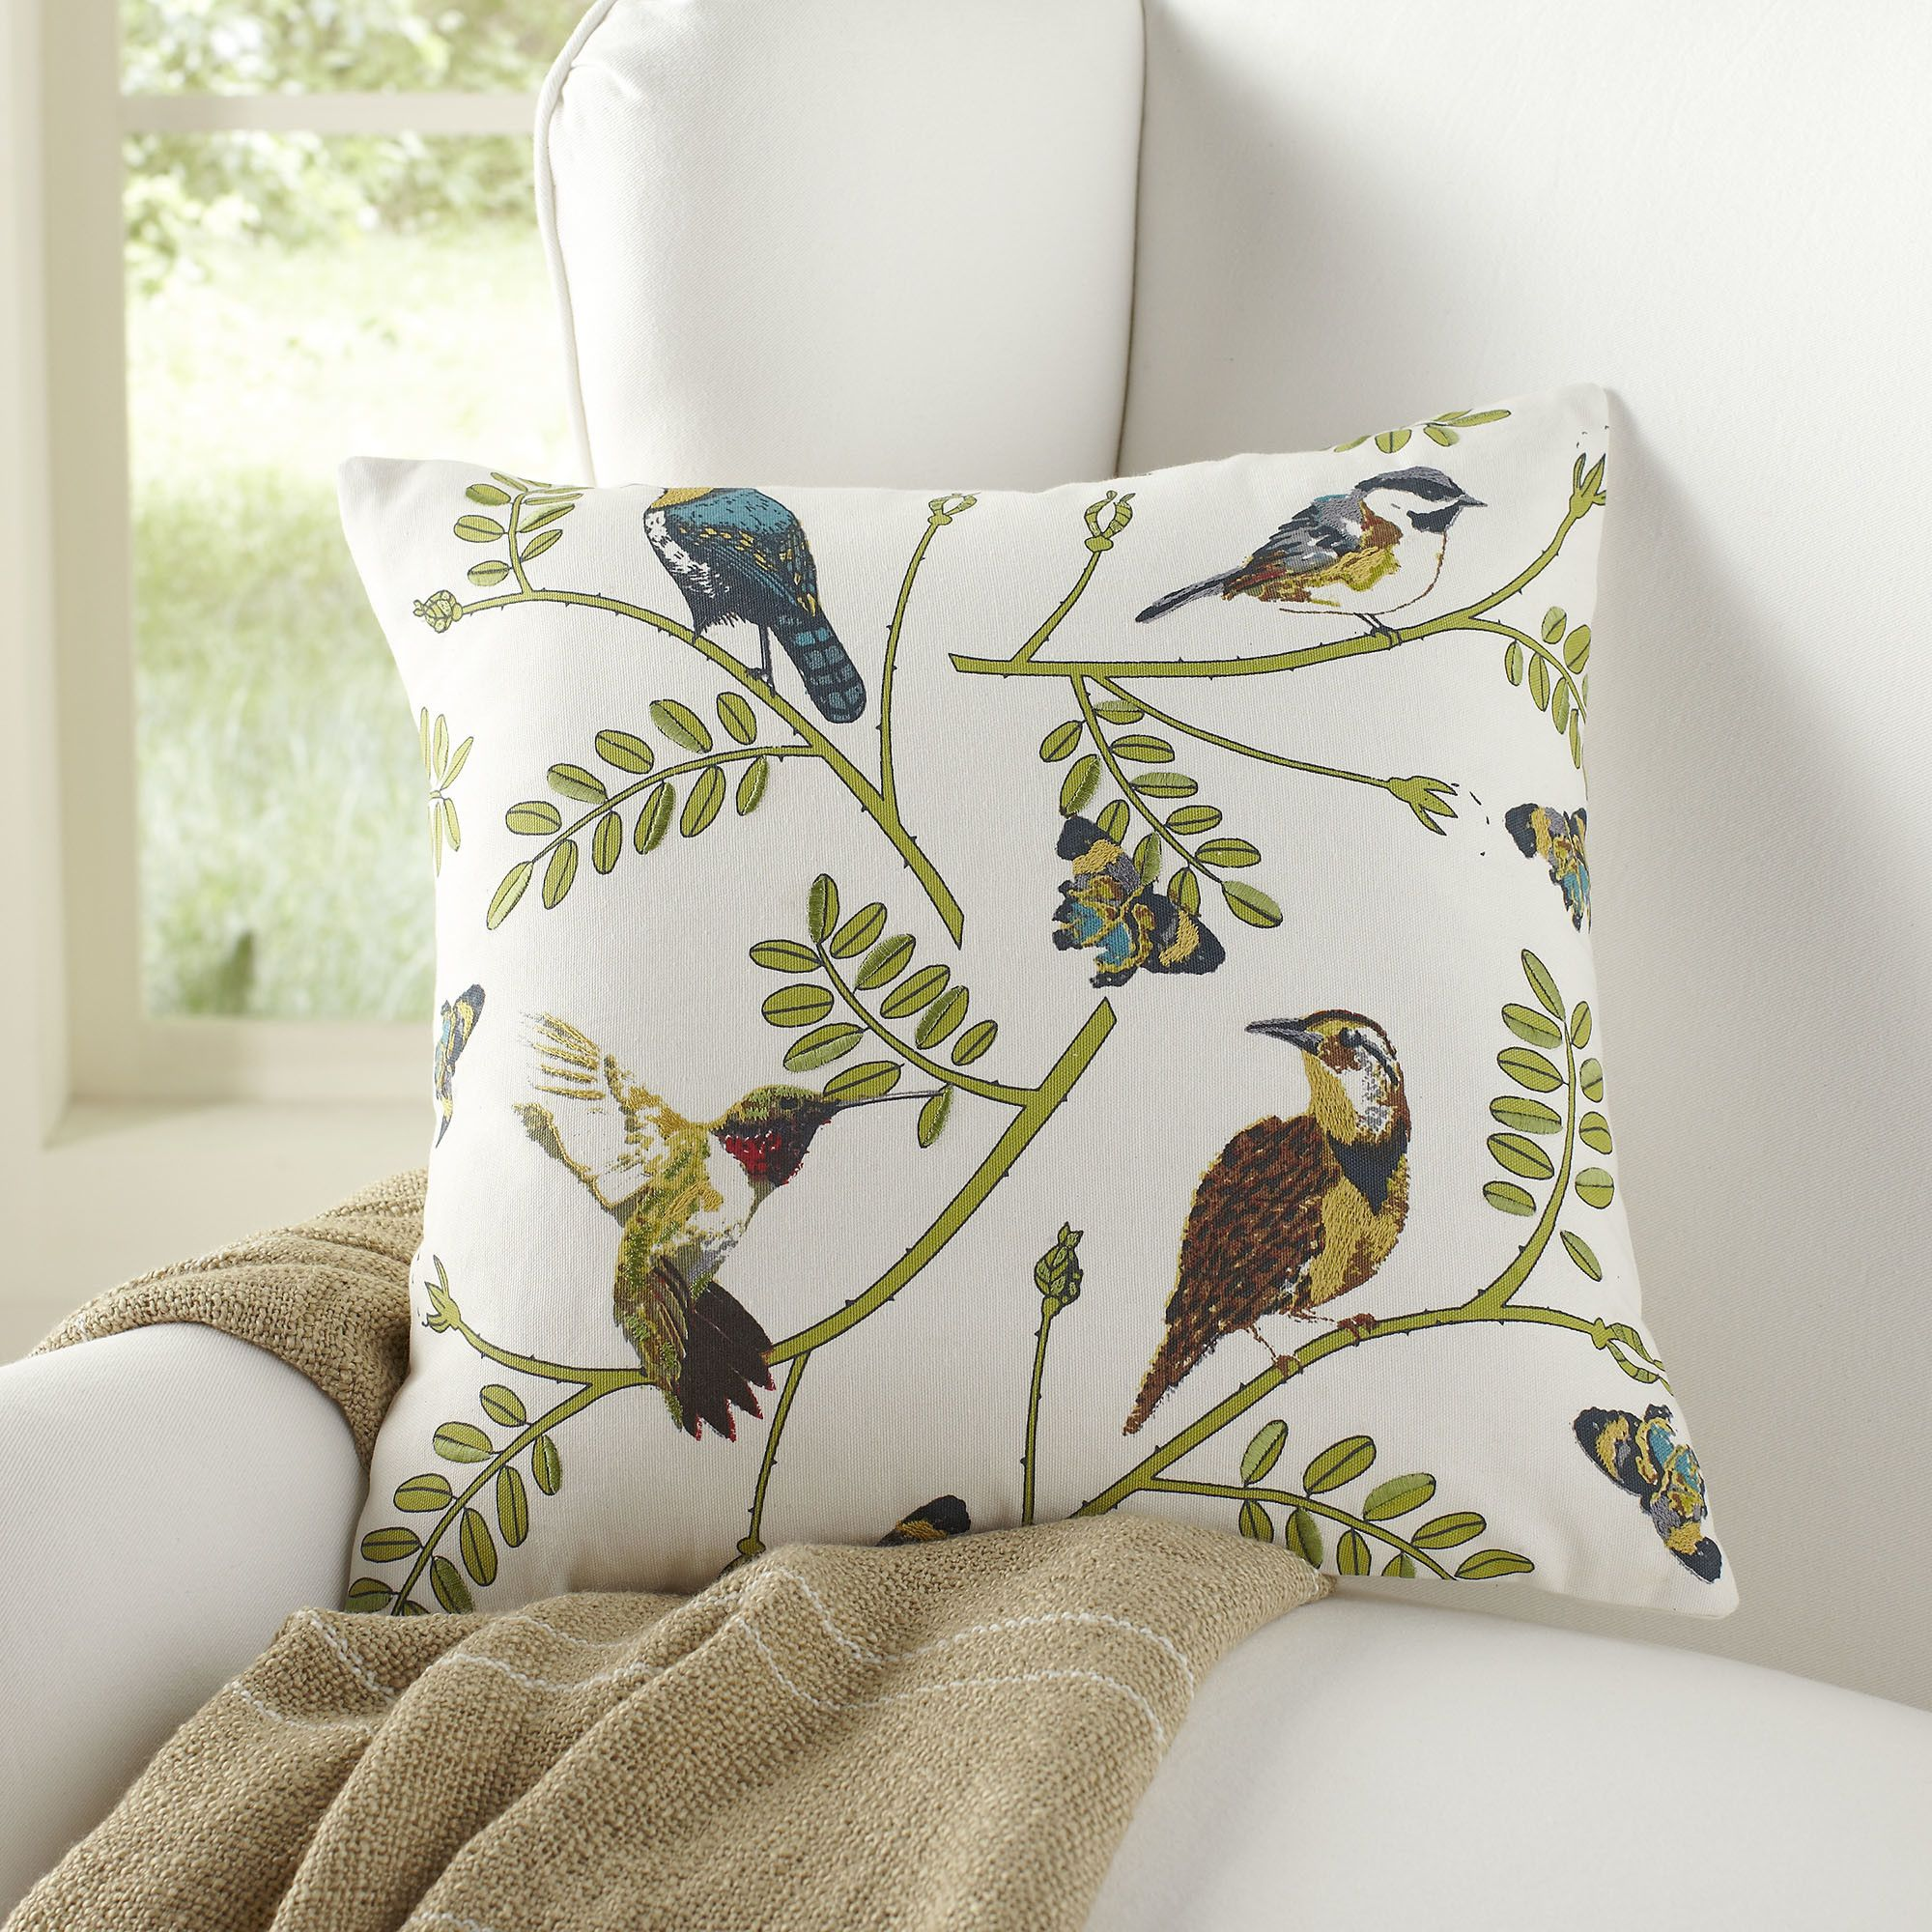 Awe Inspiring Birch Lane Martha Pillow Cover Homesteading Decorative Inzonedesignstudio Interior Chair Design Inzonedesignstudiocom